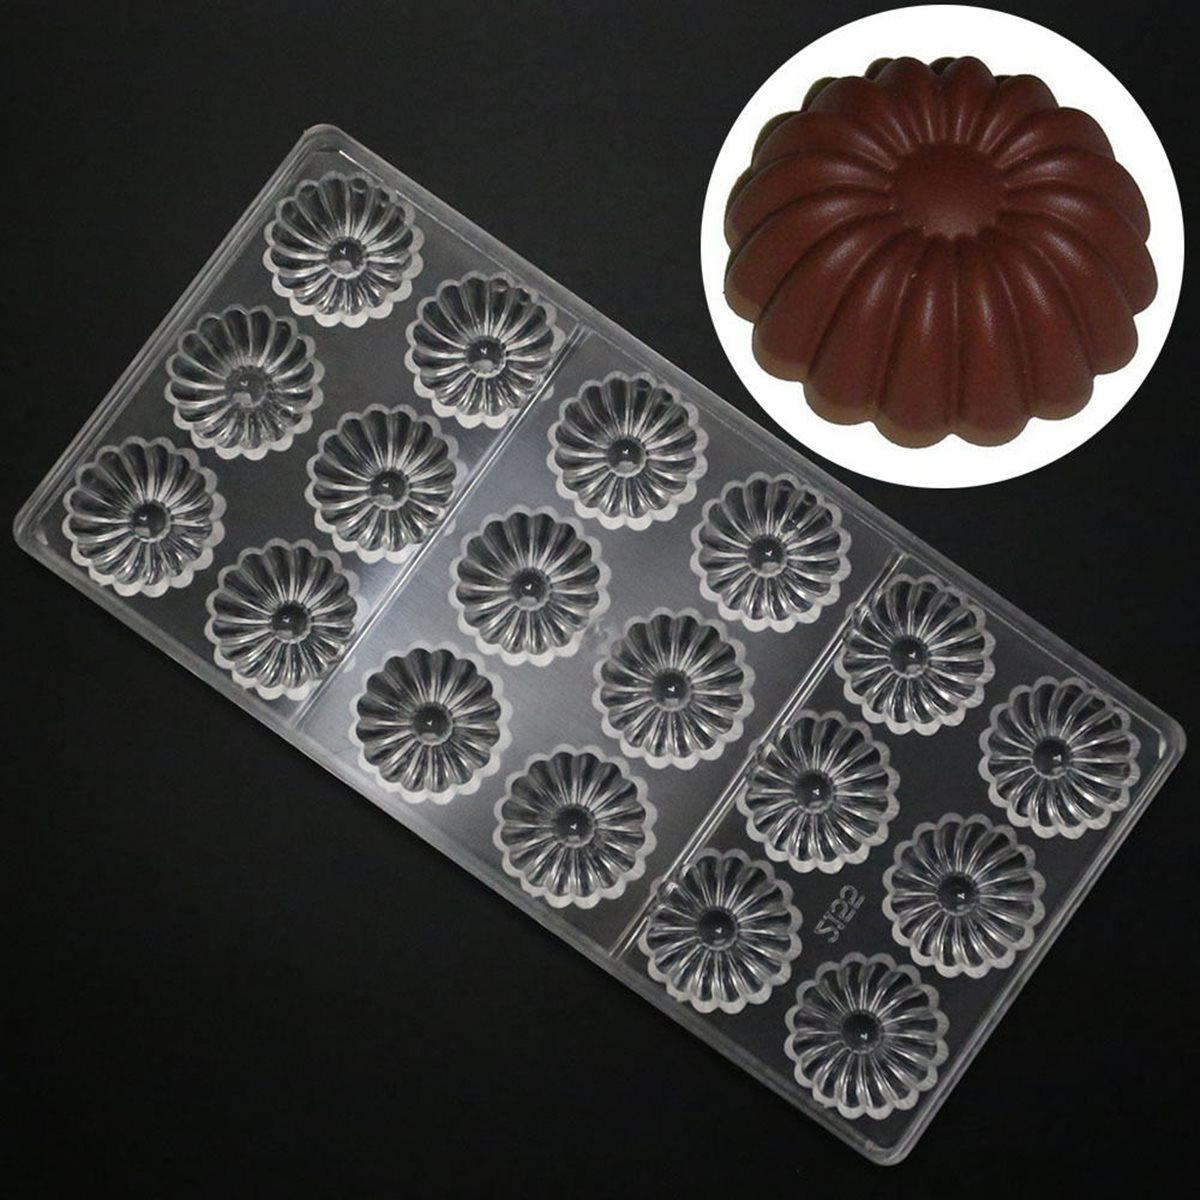 Girasol Molde Del Caramelo de Chocolate Fondant Moldes De Galletas de Plástico t